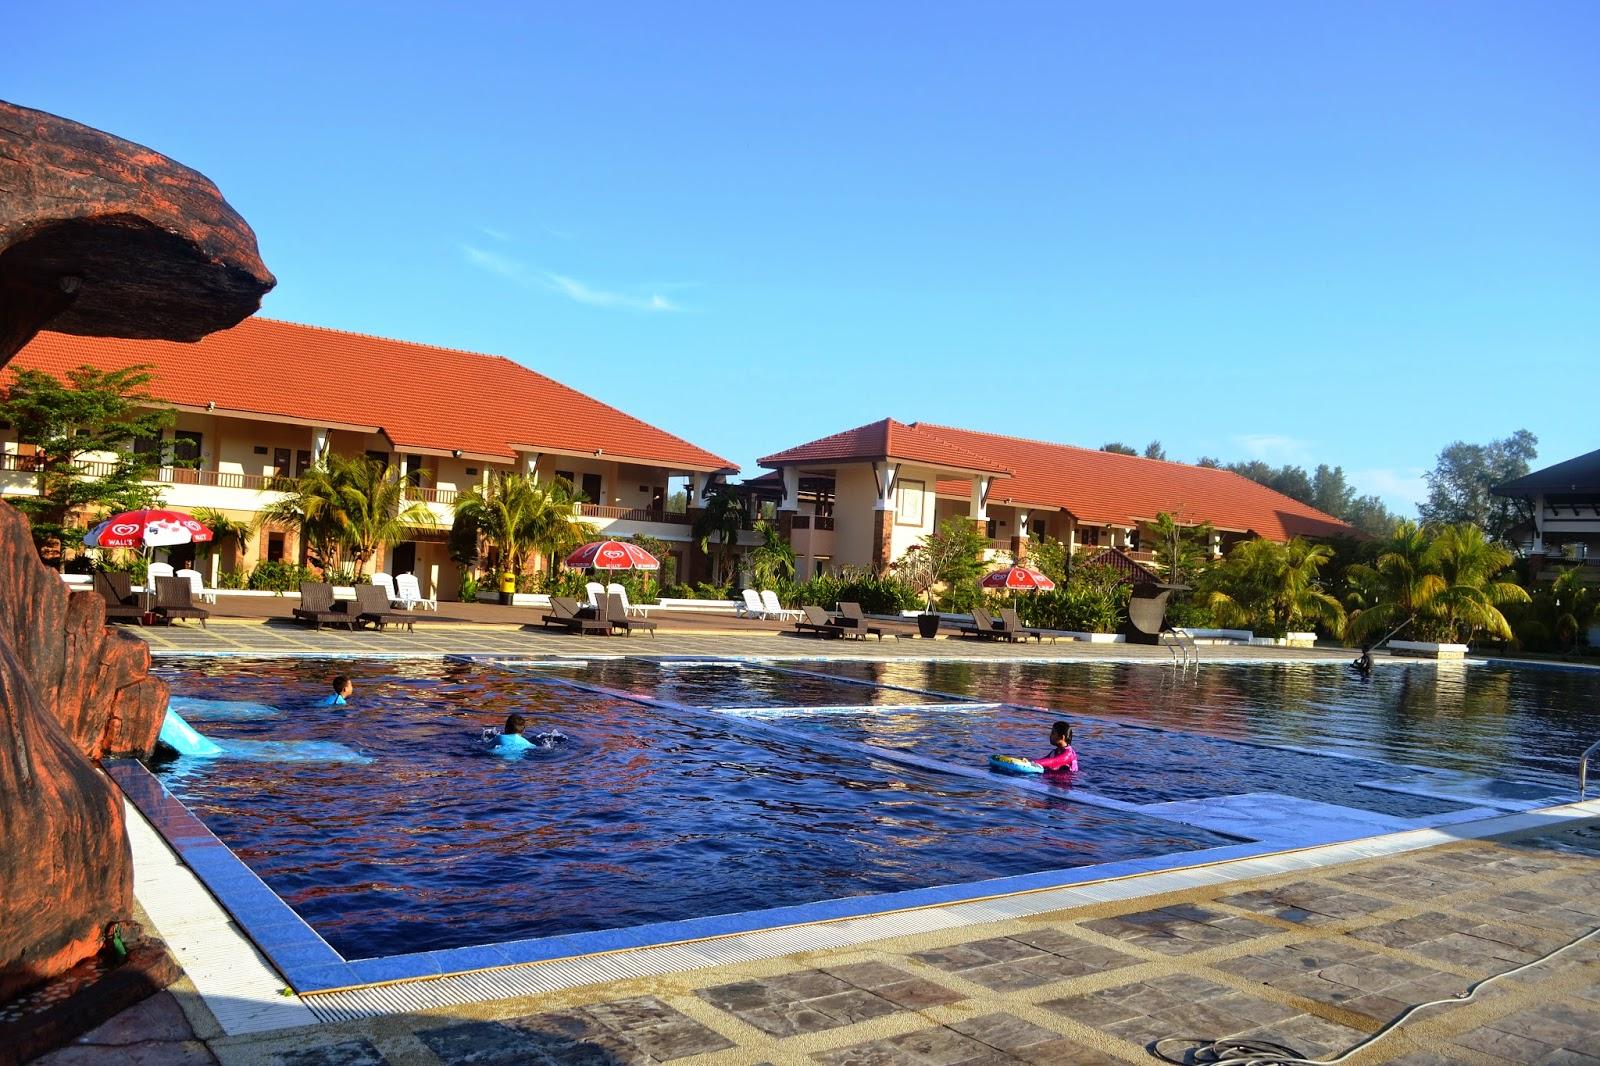 Swimming Pool Di Tok Aman Bali Beach Resort Agak Besar Juga Sebelah Kiri Untuk Anak Manakala Kanan Dewasa Waktu Gambar Ini Diambil